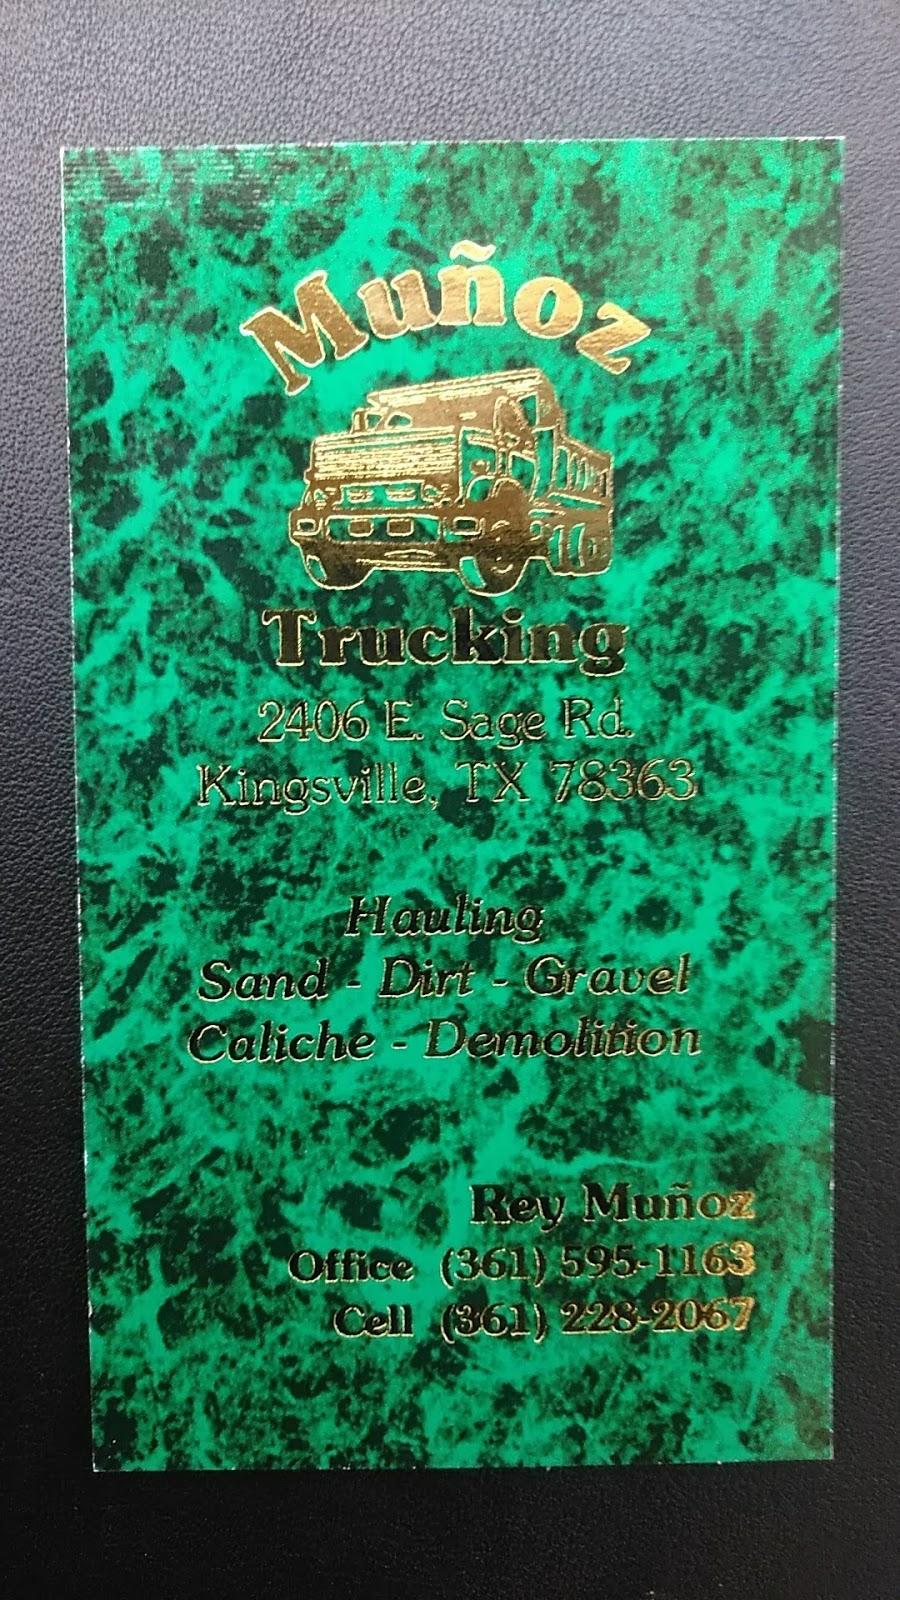 Munoz Trucking - moving company  | Photo 1 of 1 | Address: 2406 E Sage Rd, Kingsville, TX 78363, USA | Phone: (361) 595-1163